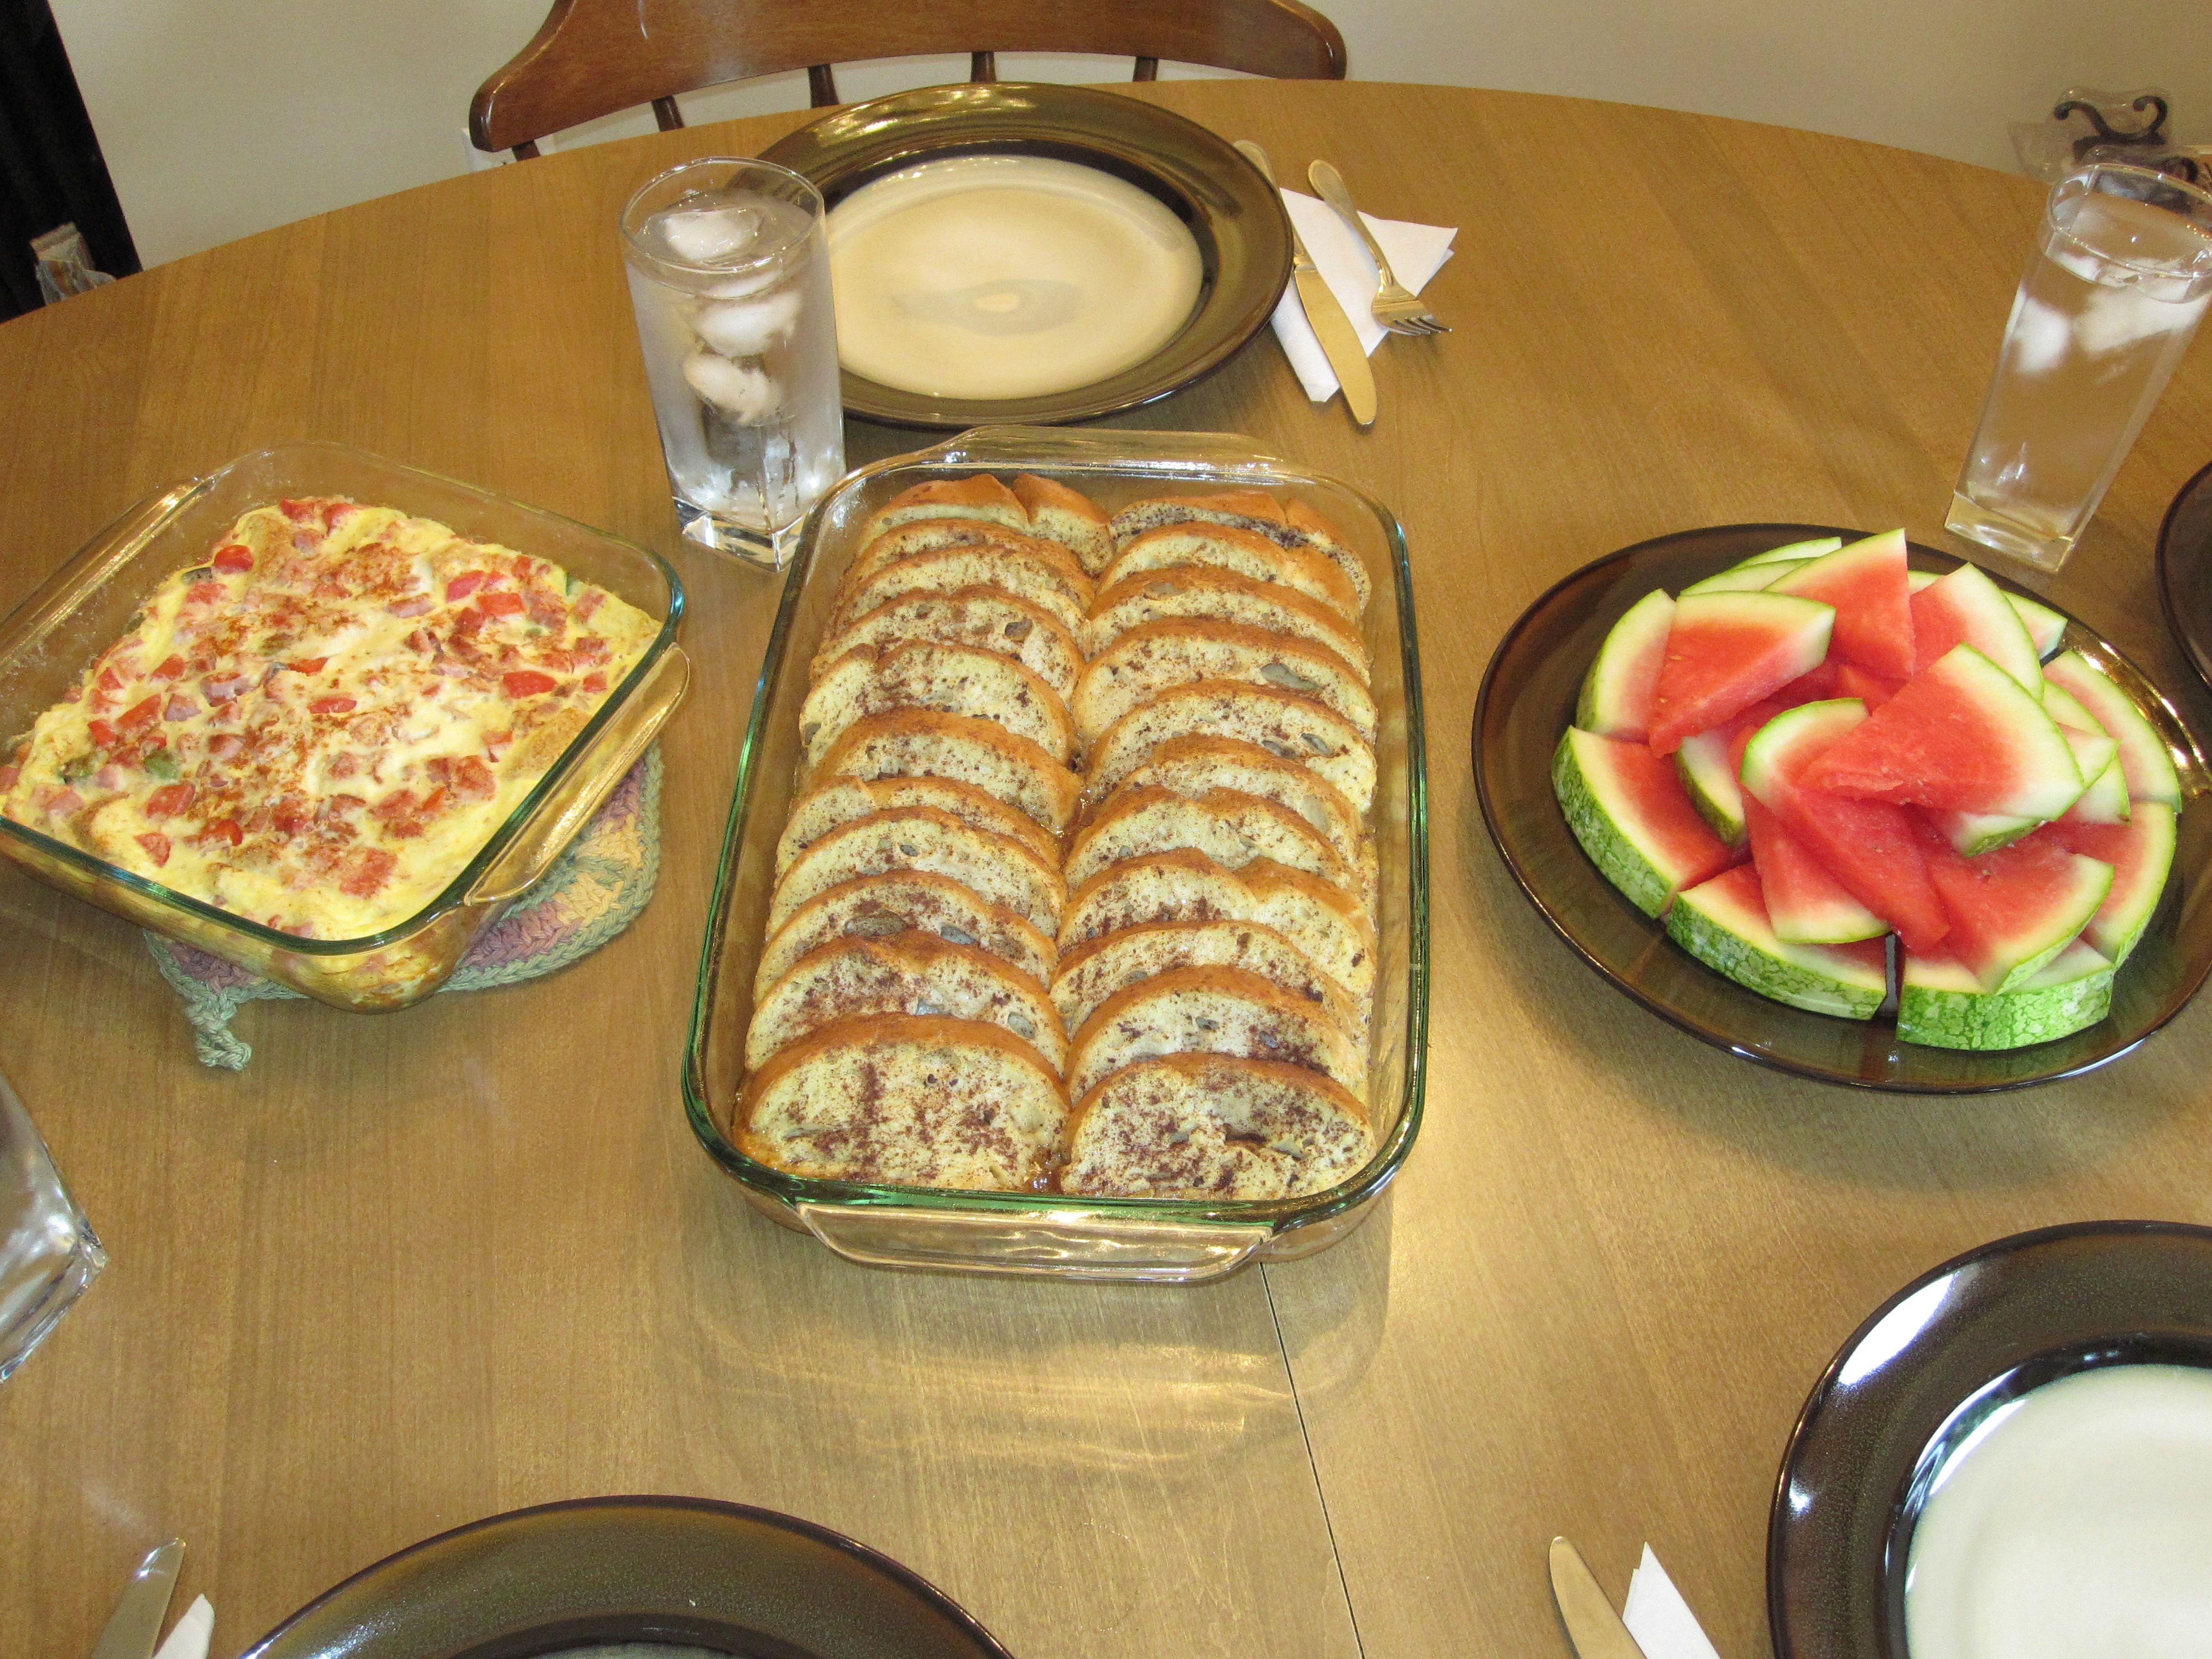 birthday dinner homemade thank you brunch - Strata Recipes For Brunch